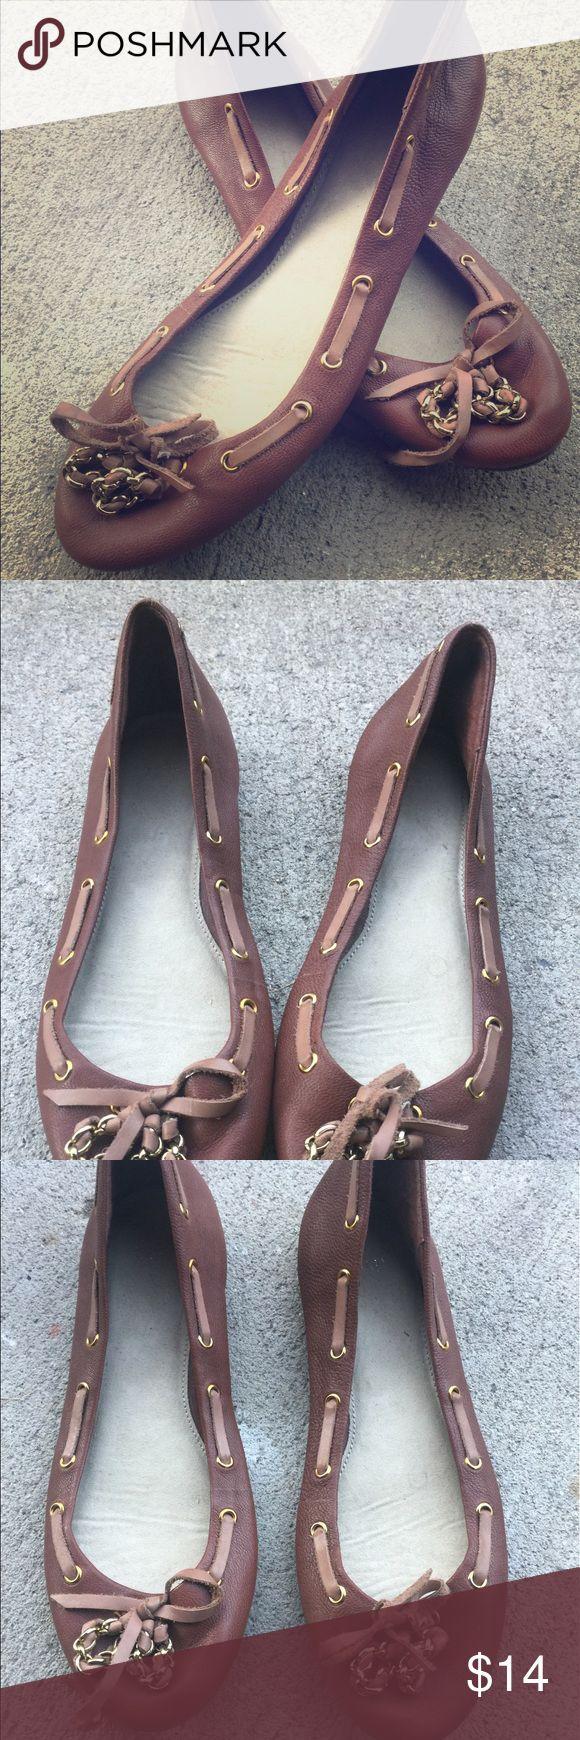 Gap ballet flats Gap leather ballet flats size 7 GAP Shoes Flats & Loafers